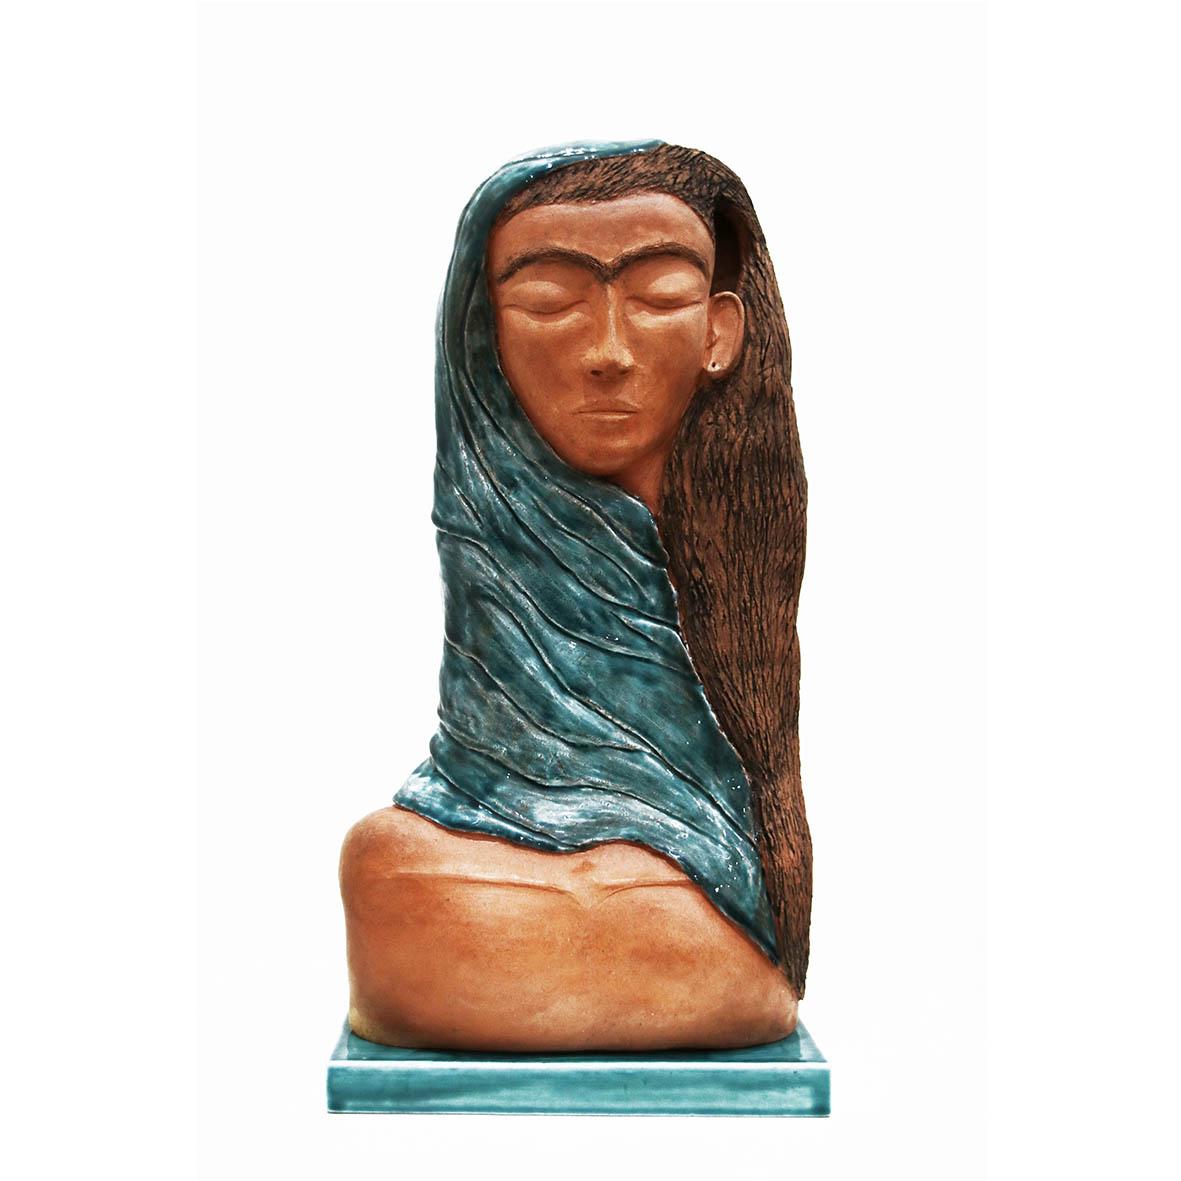 Nava Derakhchani Khanum 2019 Mixed media ceramic sculpture 23 x 10.5 x 45 cm